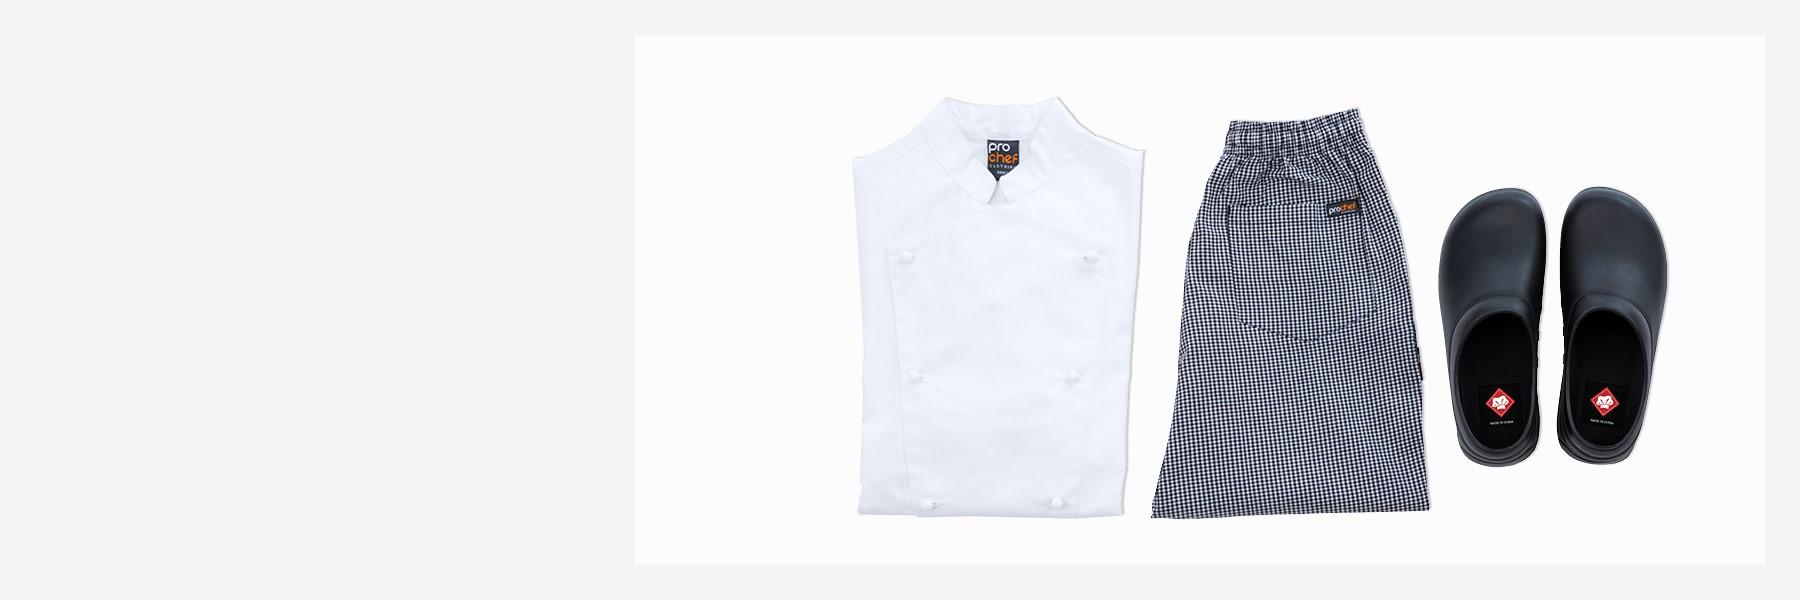 Chef Jacket, Pants, Clogs